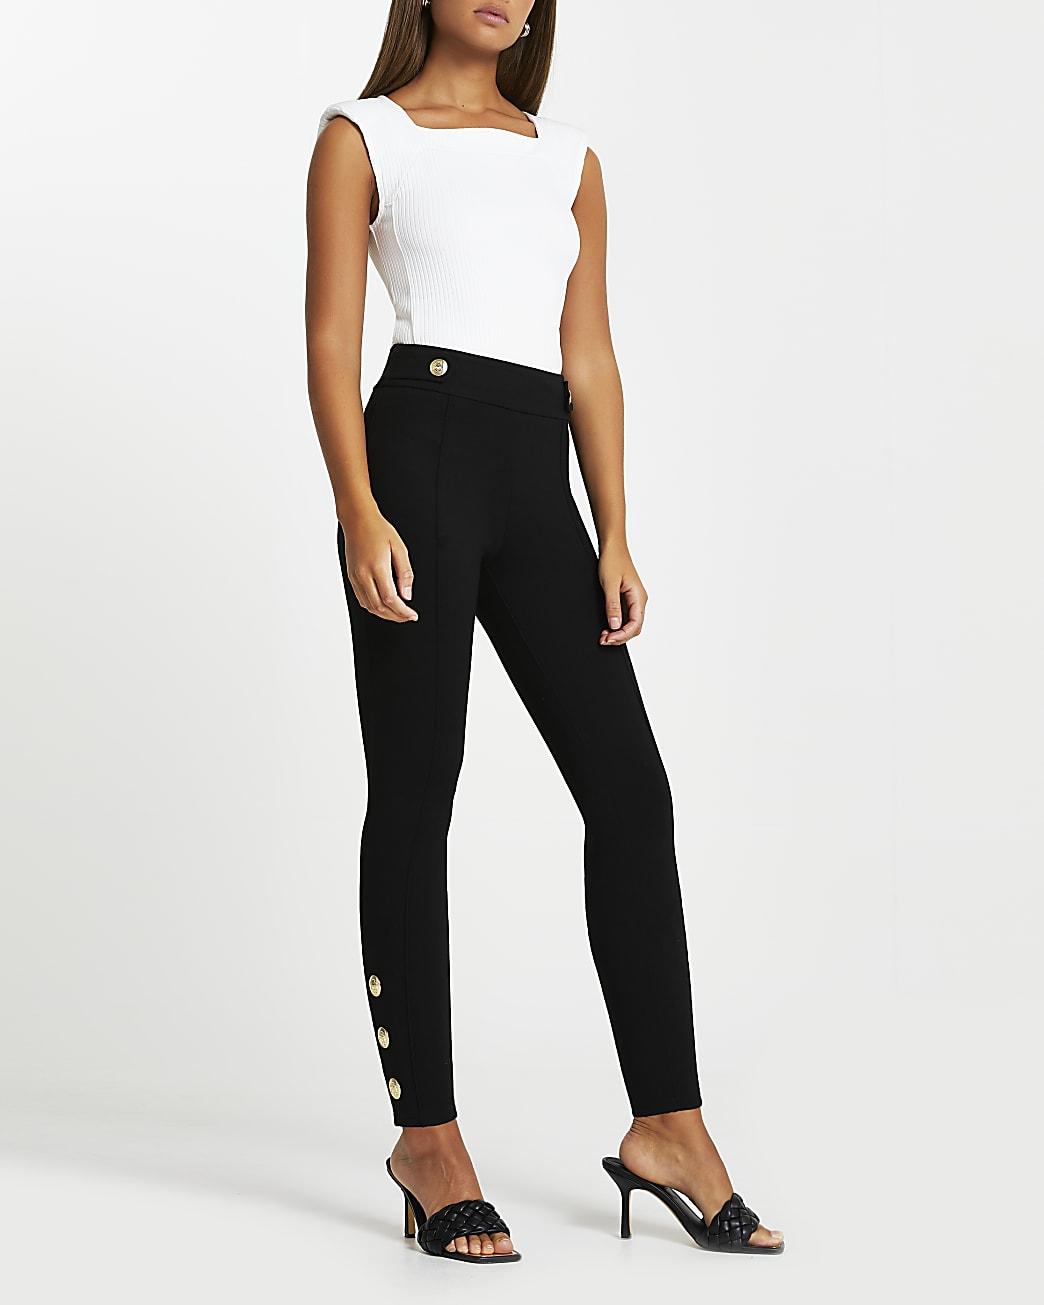 Black ponte leggings